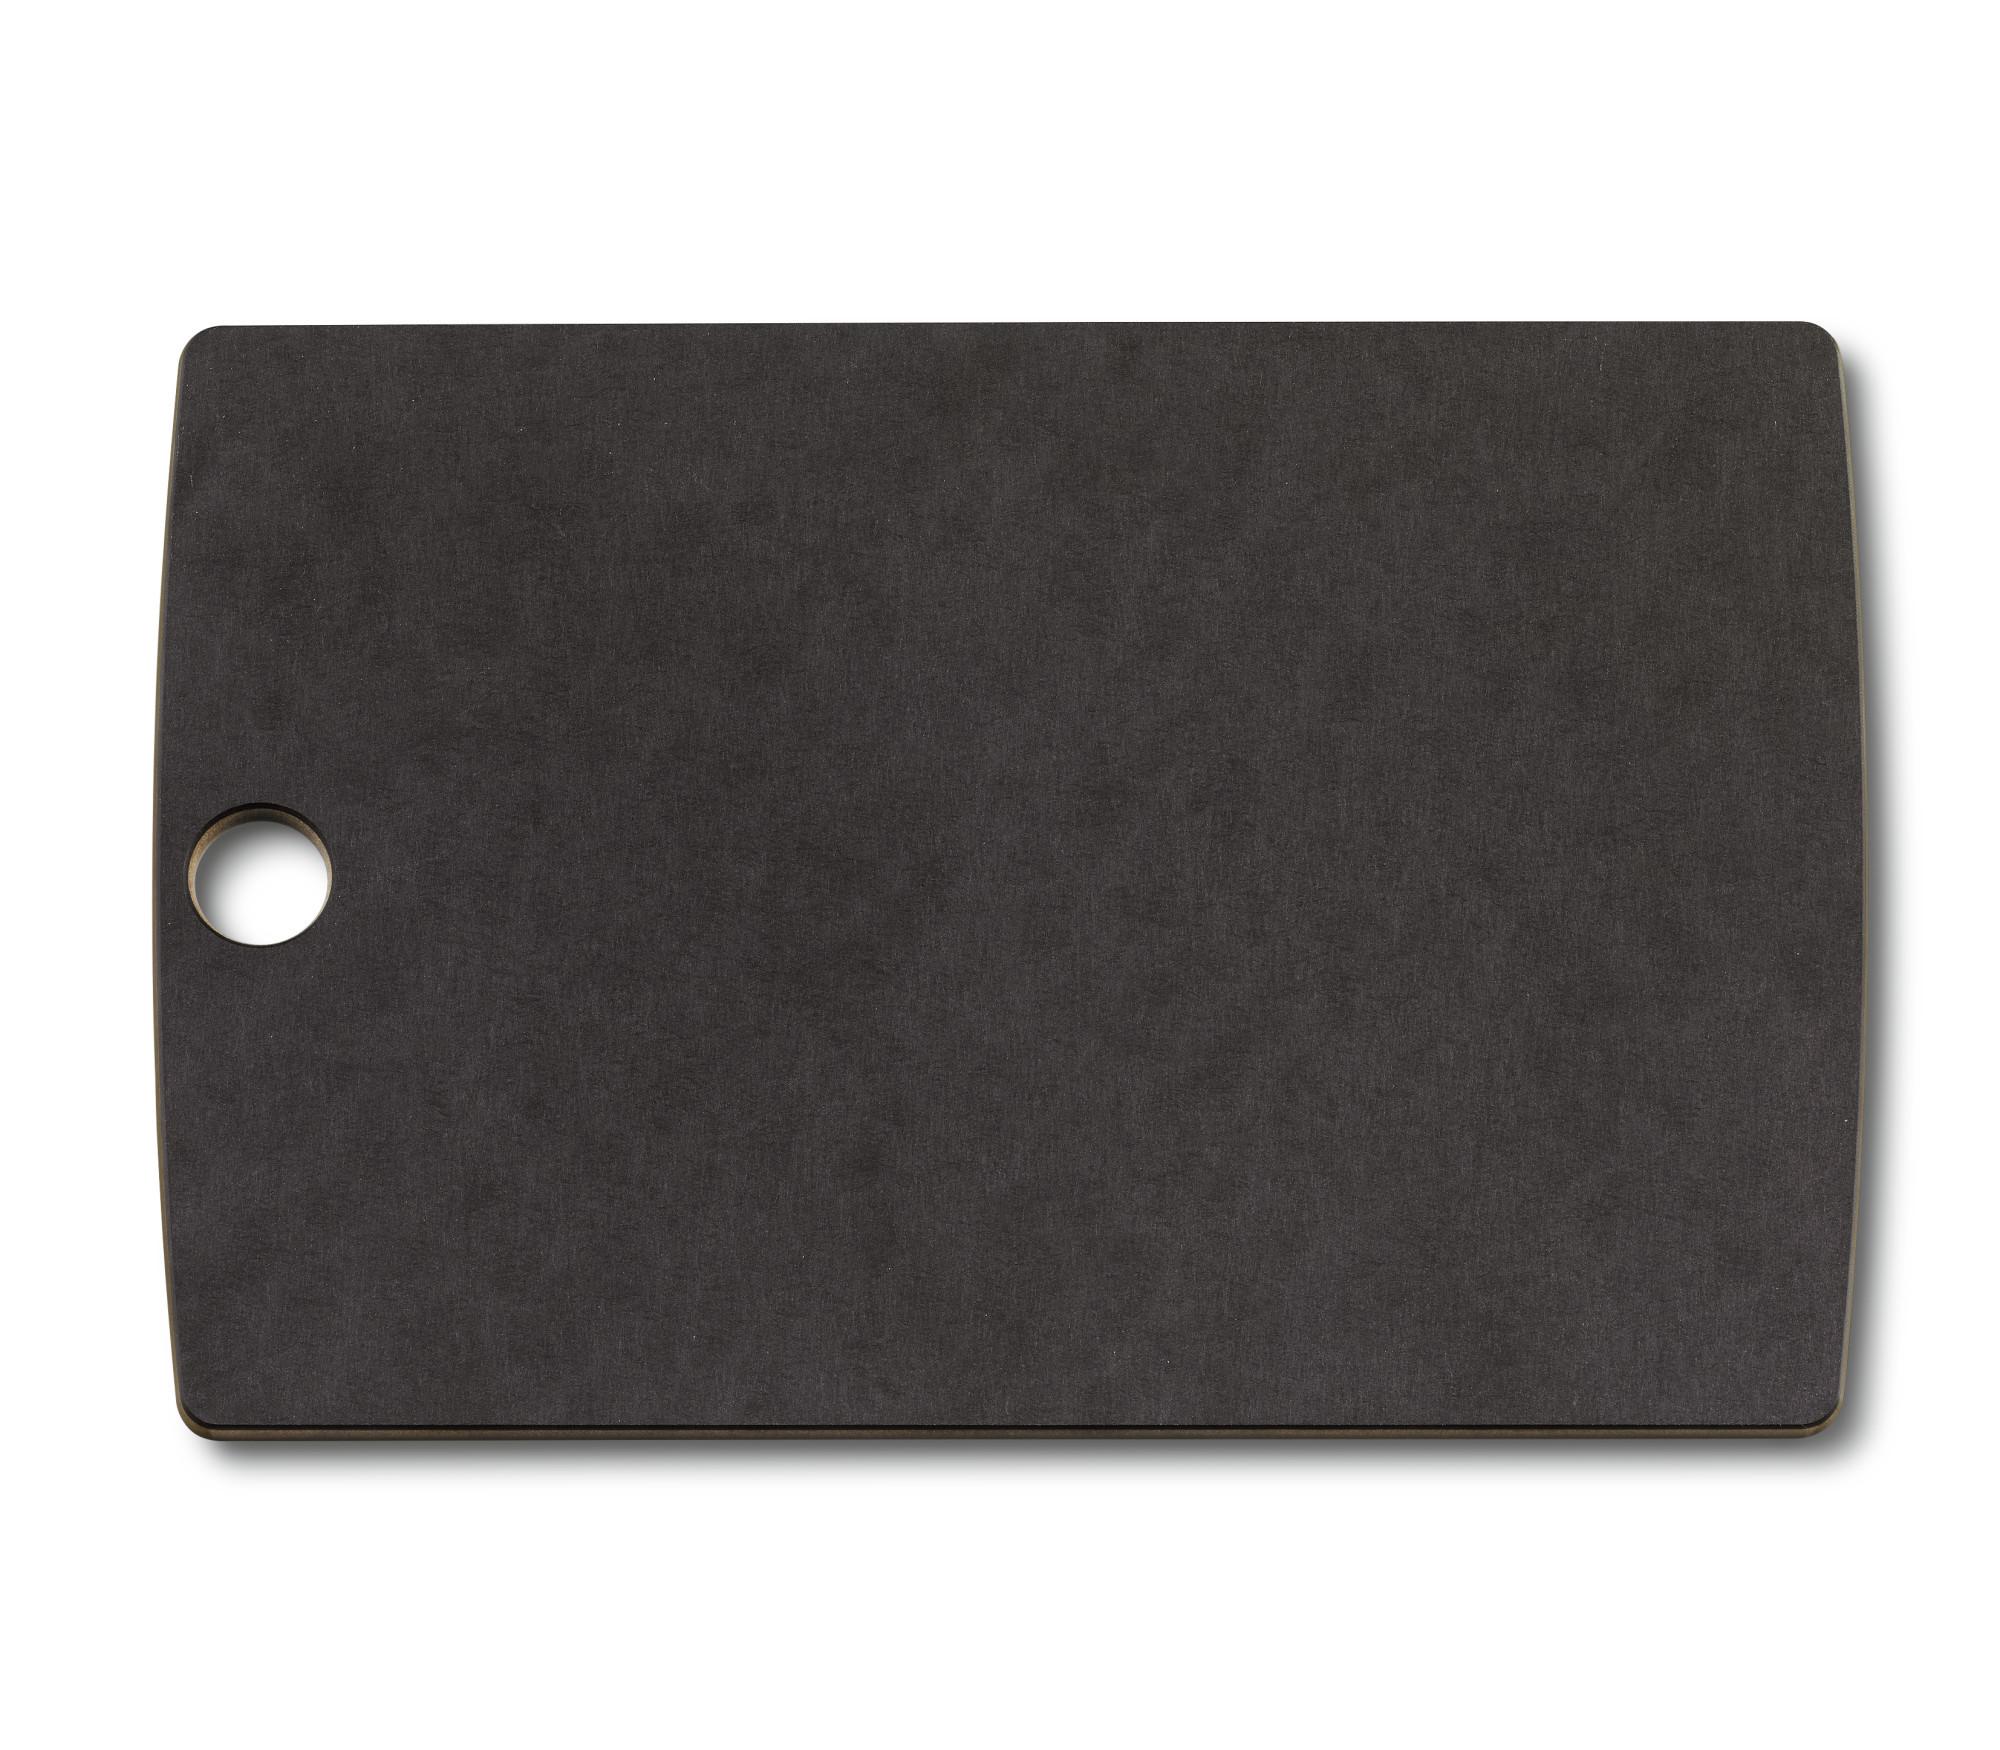 Разделочная доска Victorinox S (7.4110.3) размер 241x165x7 мм., цвет чёрный